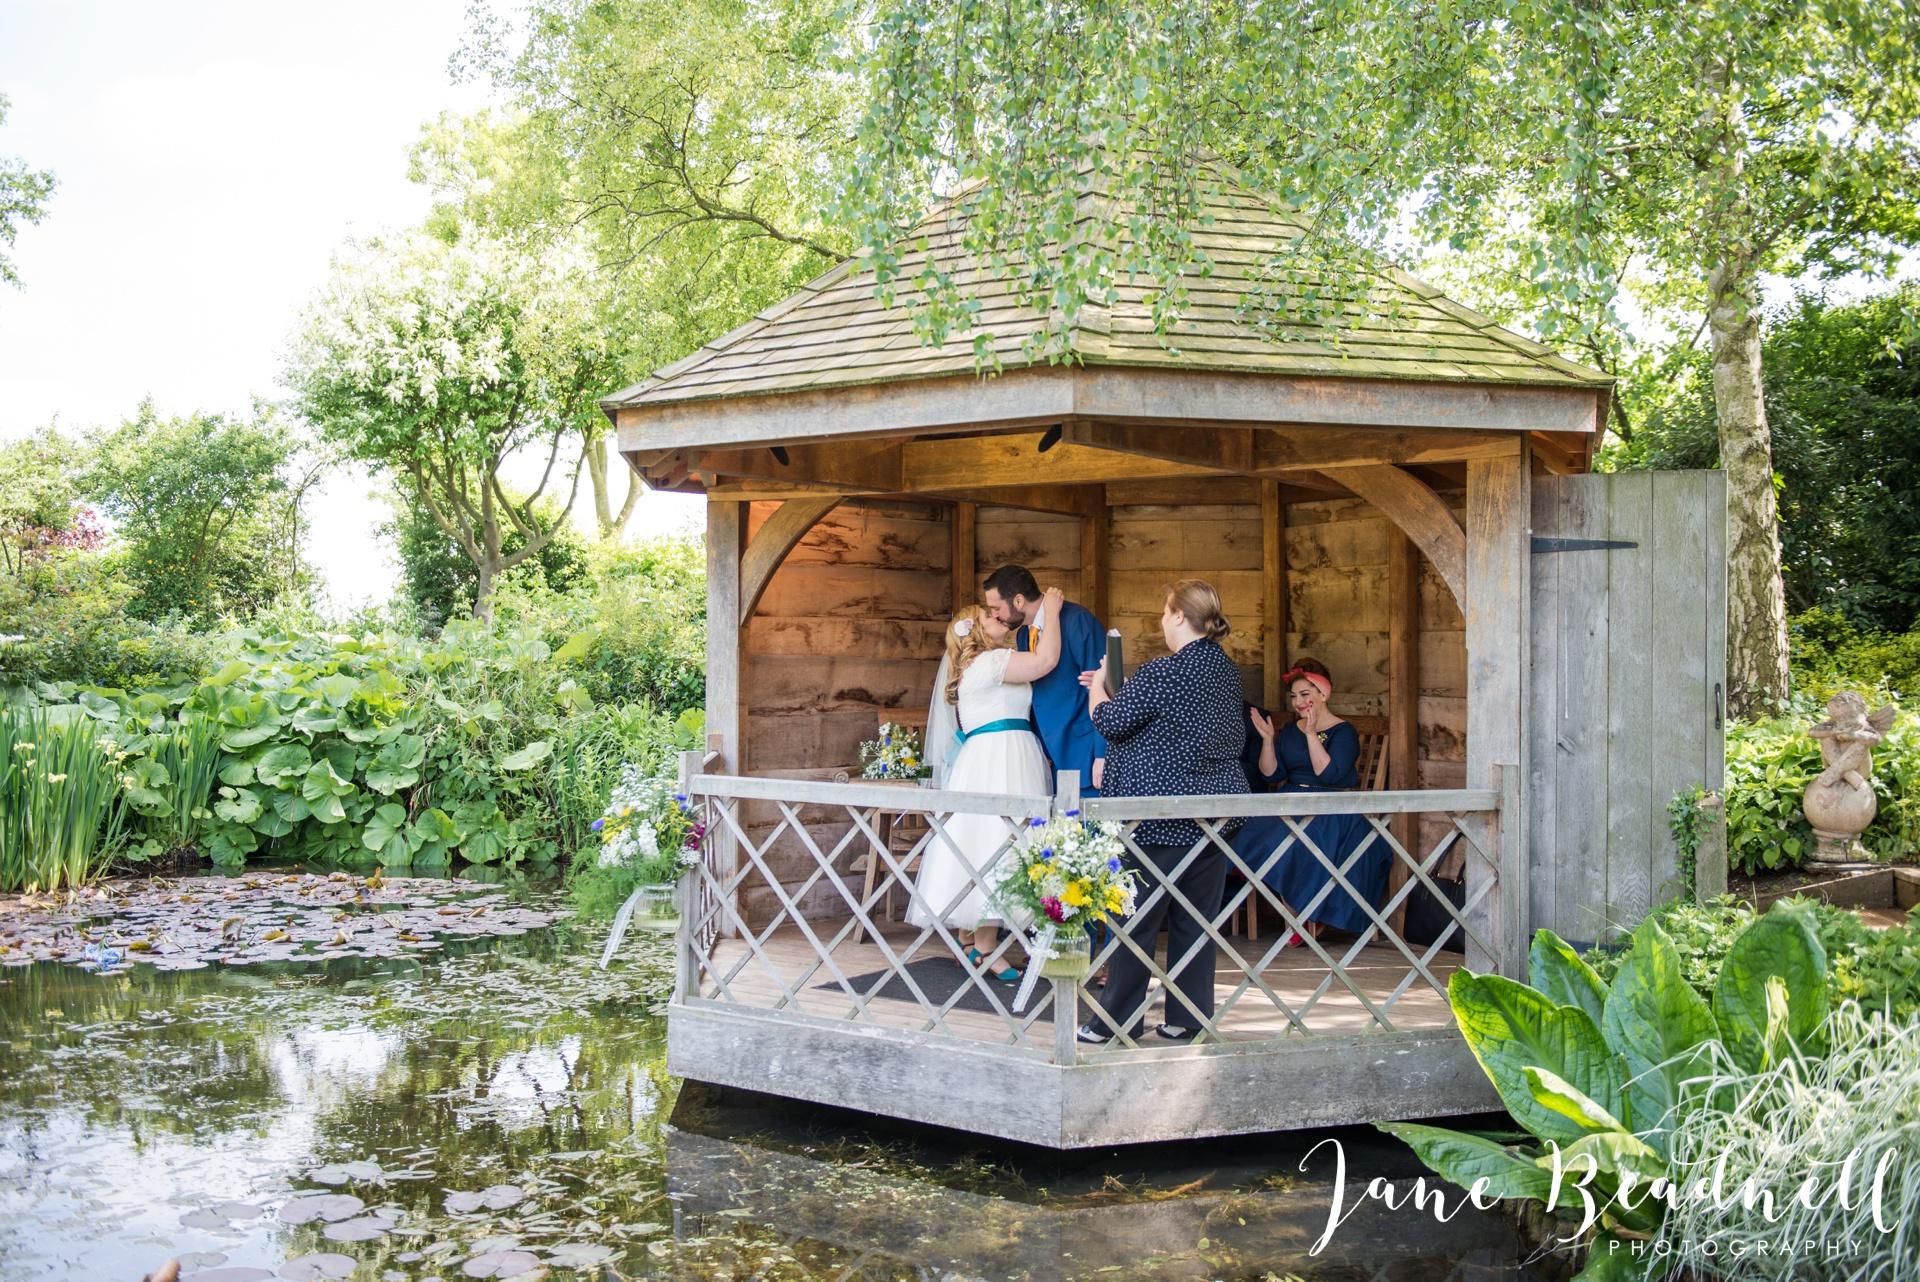 South Farm Wedding photography Hertfordshire by Jane Beadnell Photography fine art wedding photographer_0074